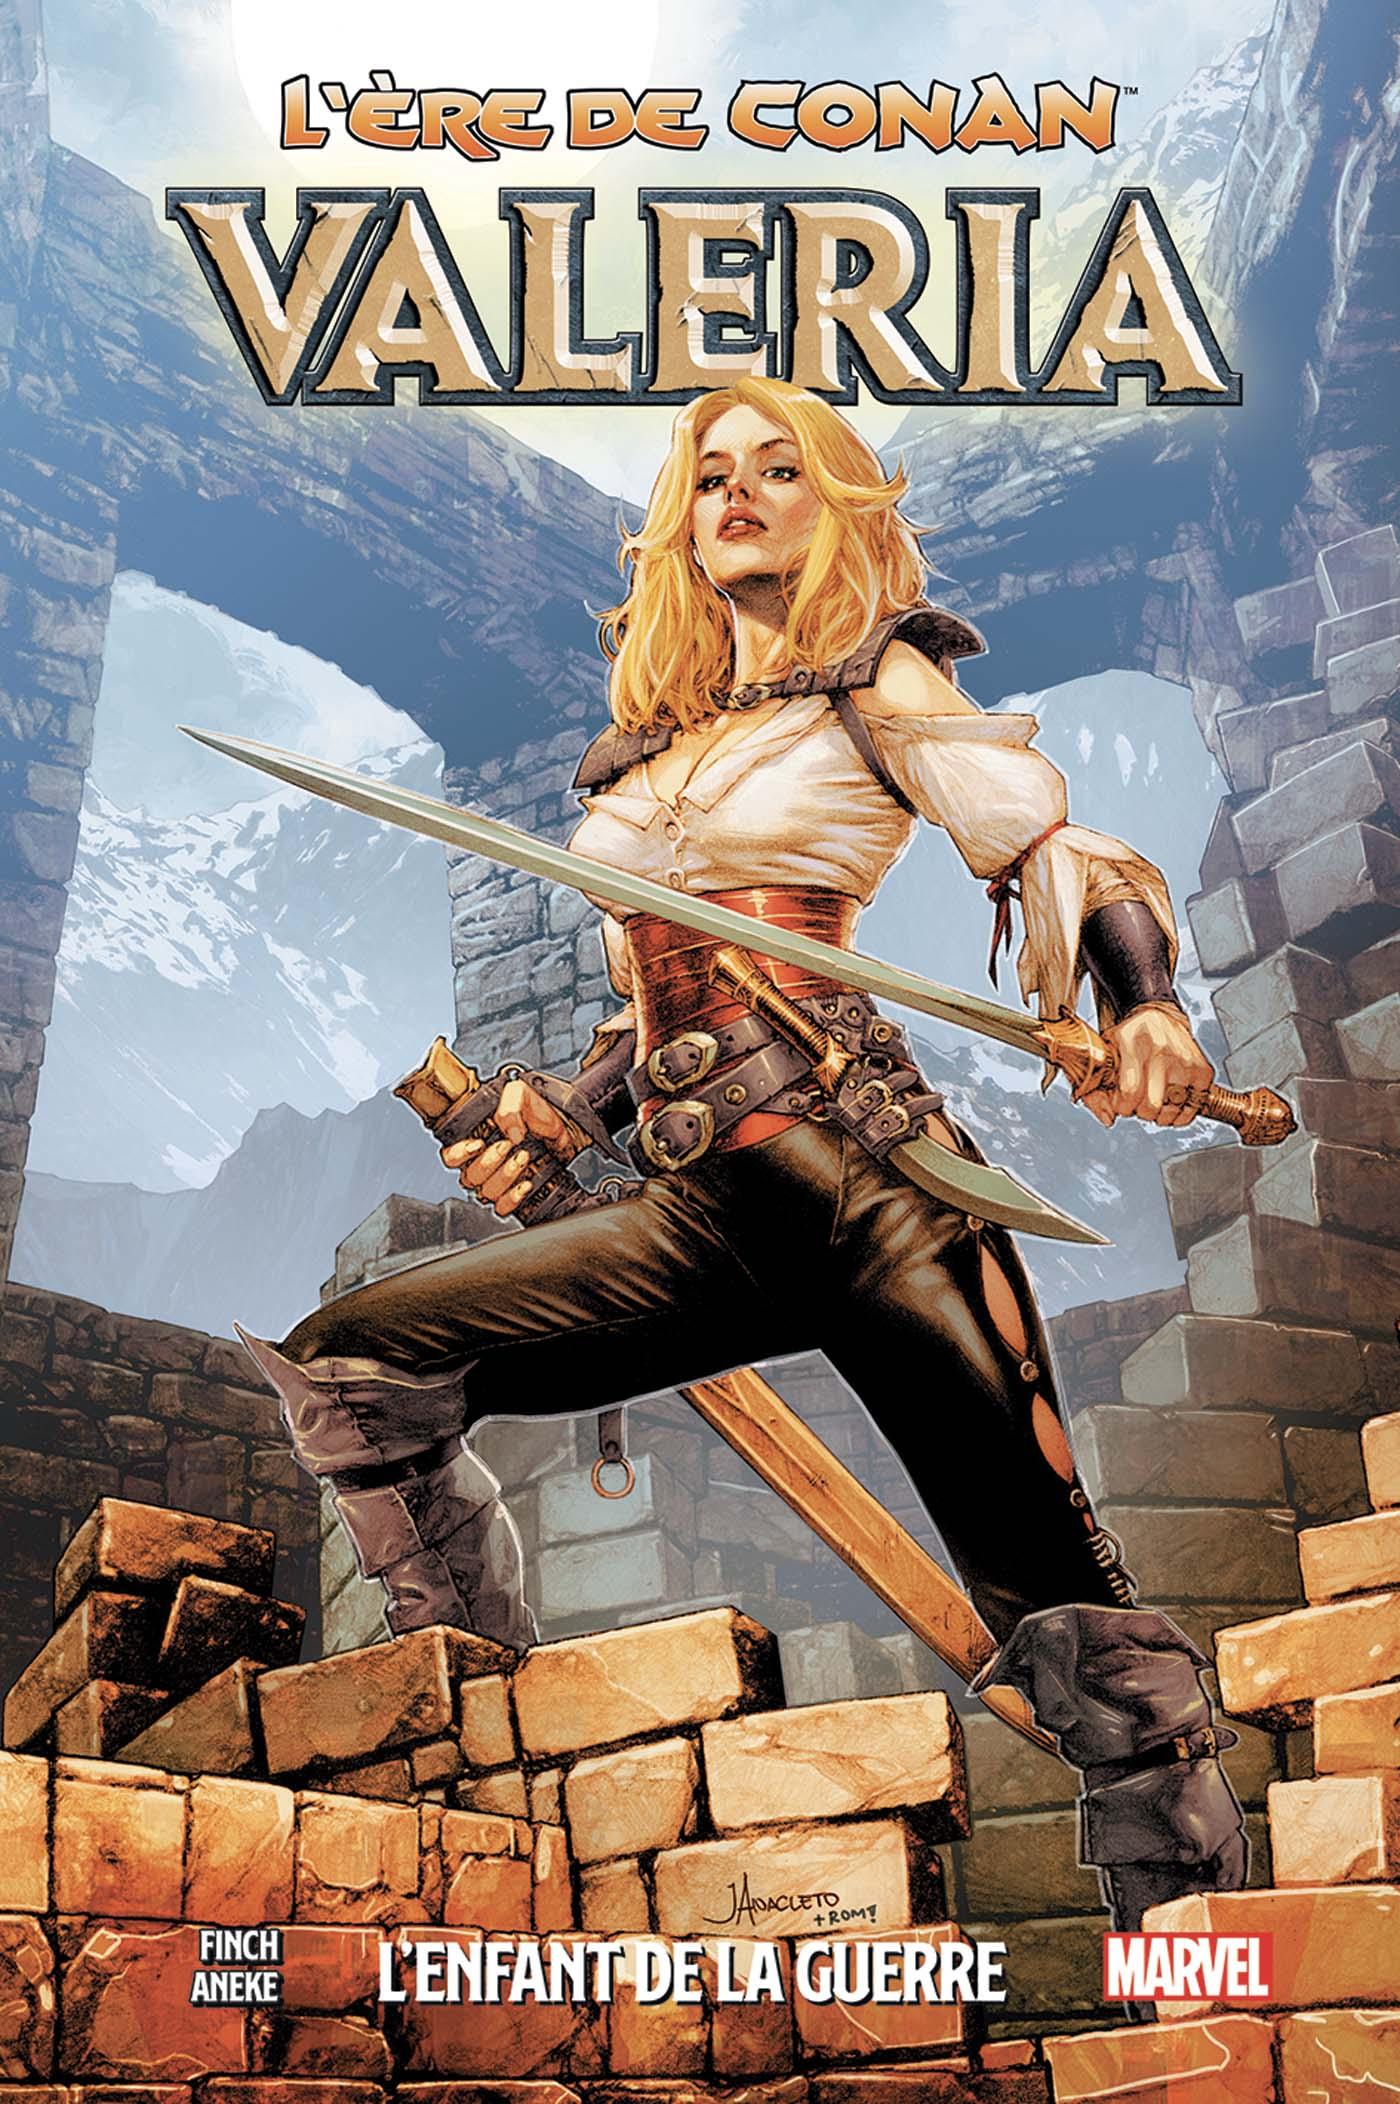 L'ère de Conan - Valeria 1